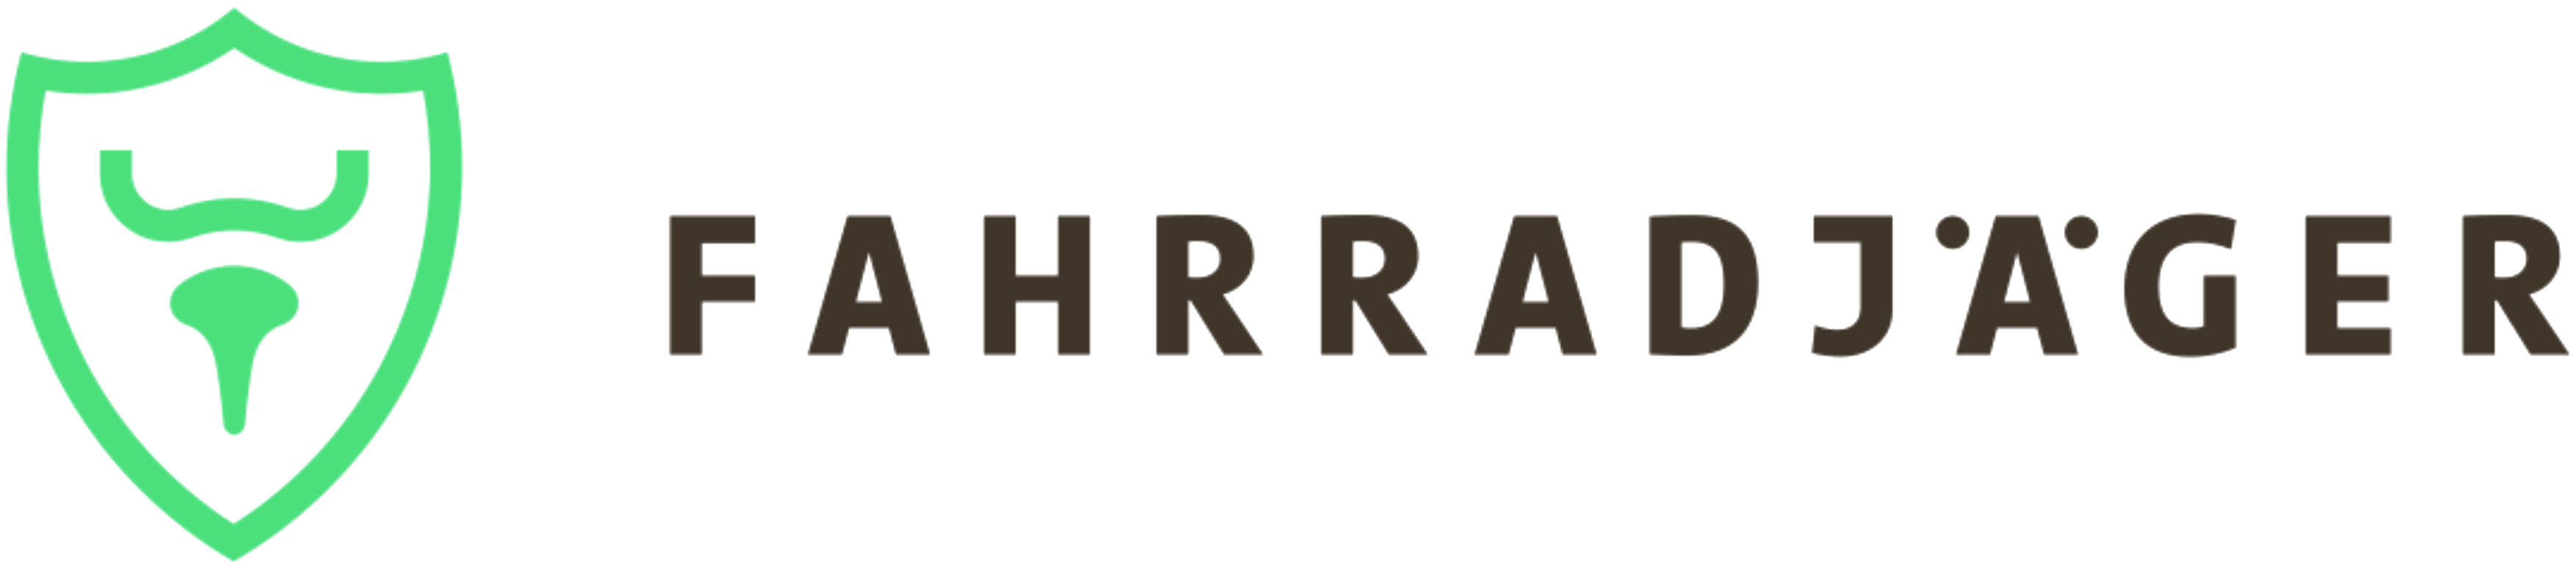 FahrradJaeger_Logo_transparent